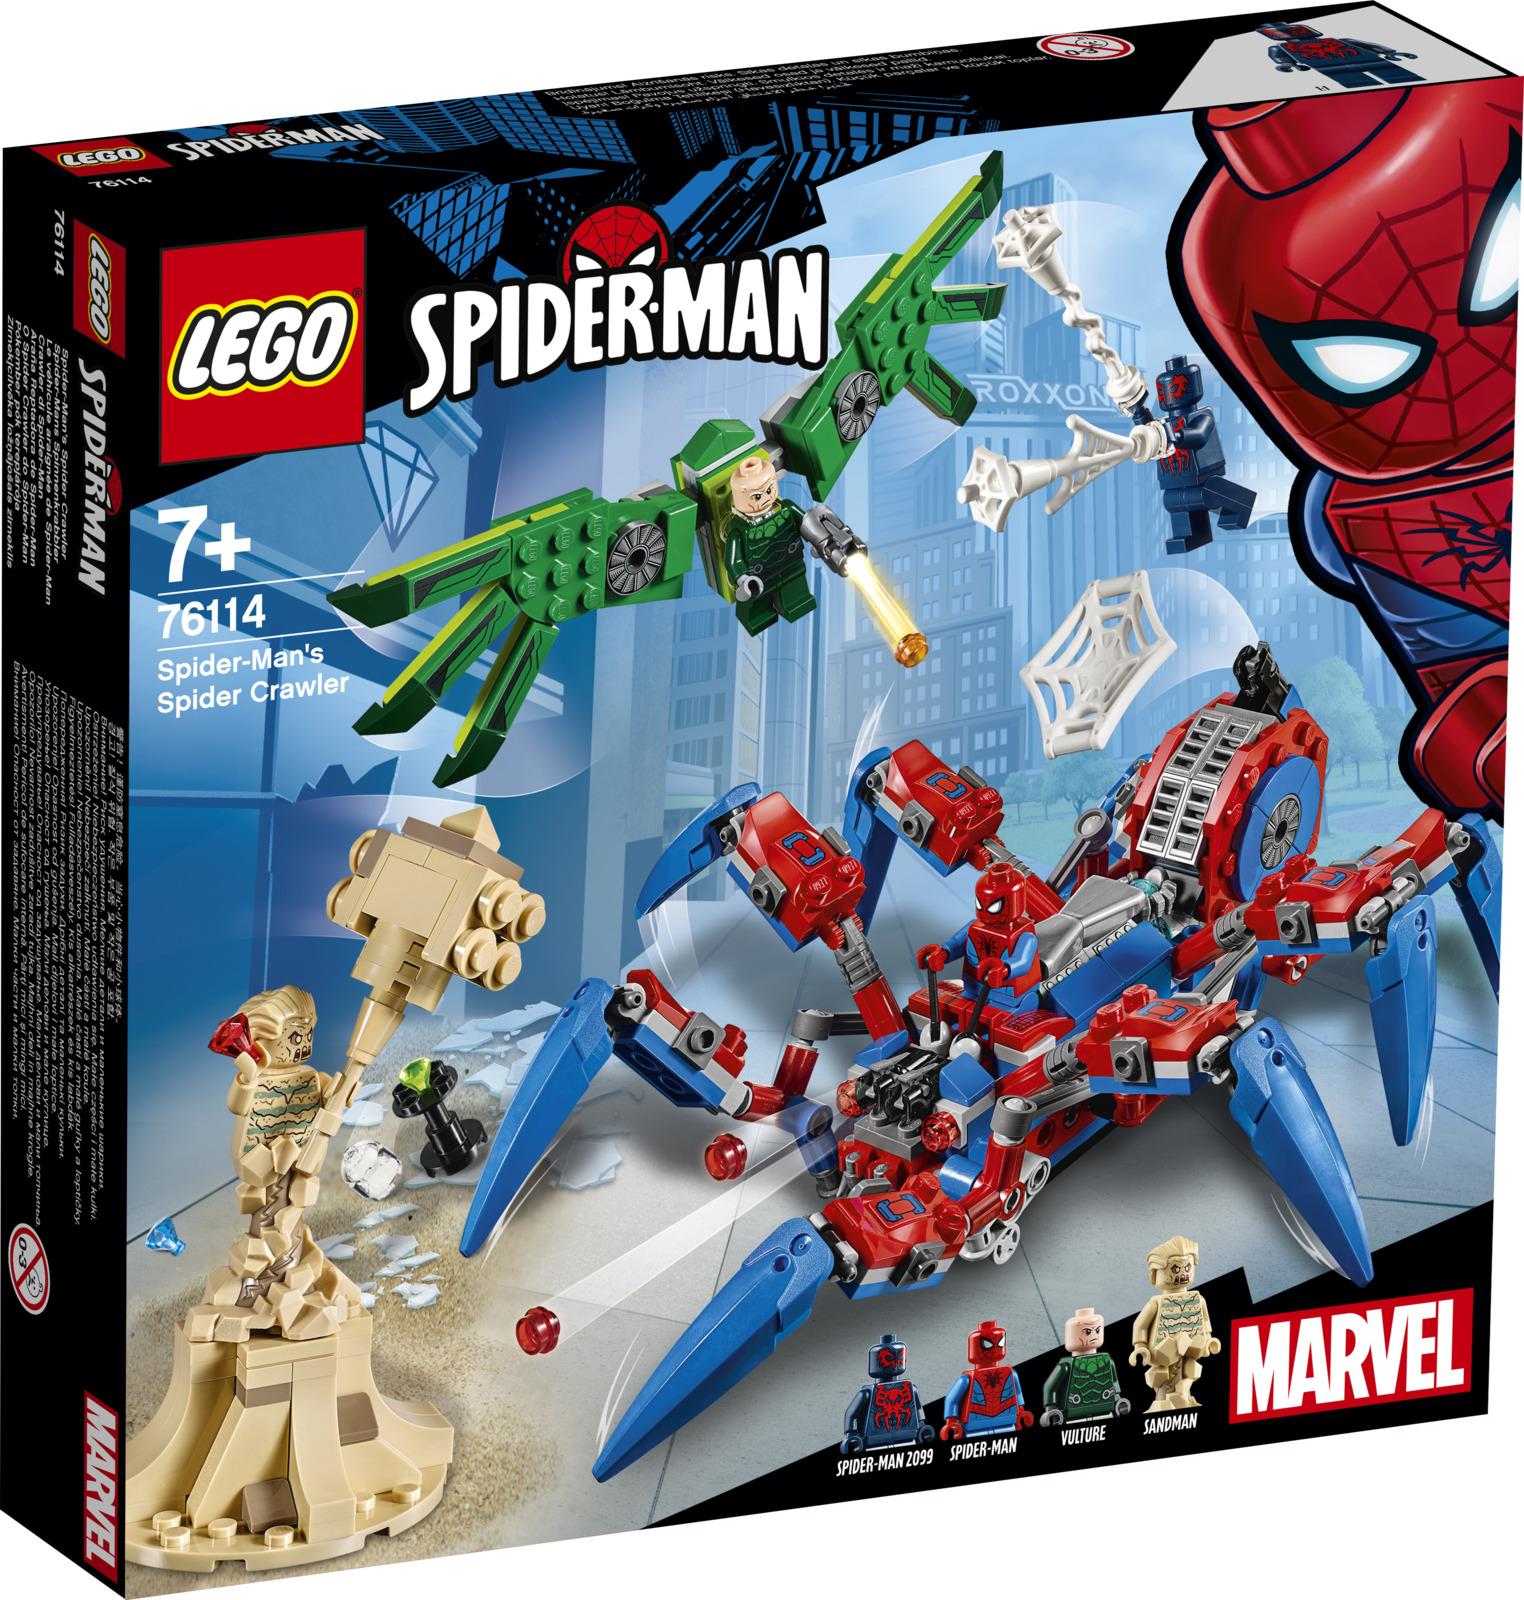 LEGO Super Heroes Marvel 76114 Паучий вездеход Конструктор конструктор игровой lego 76114 super heroes паучий вездеход